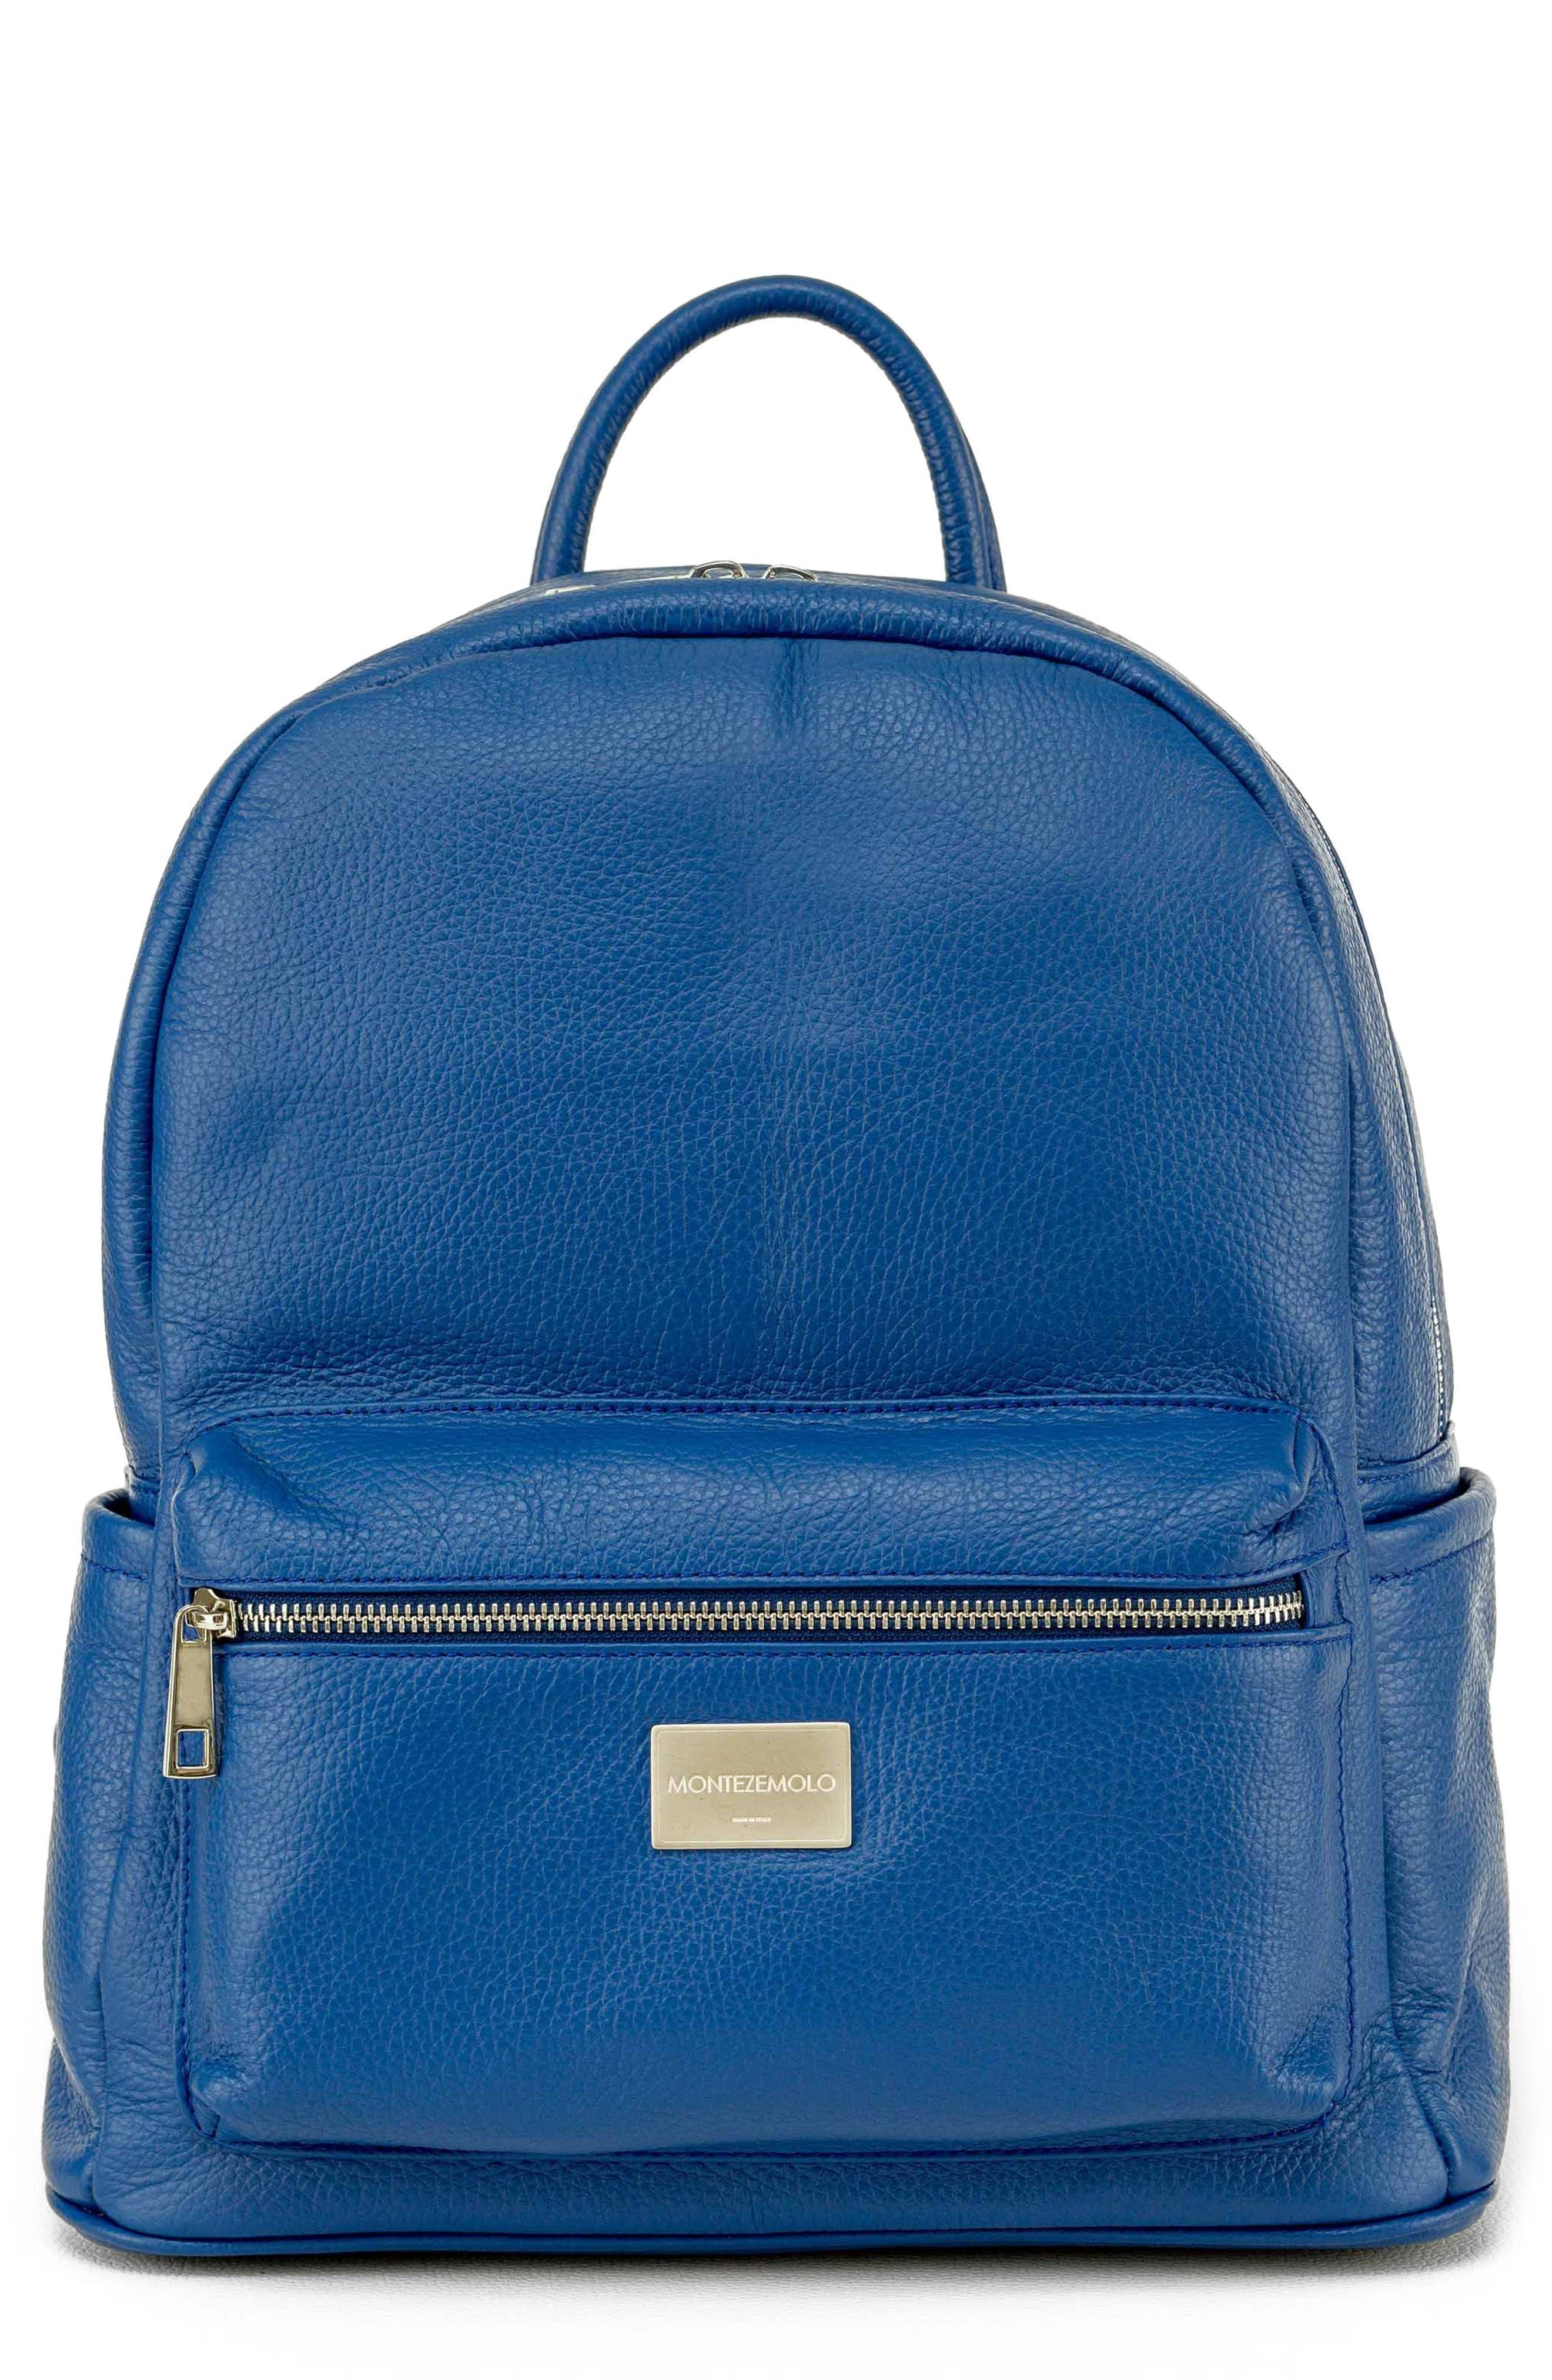 Alternate Image 1 Selected - MONTEZEMOLO Leather Backpack